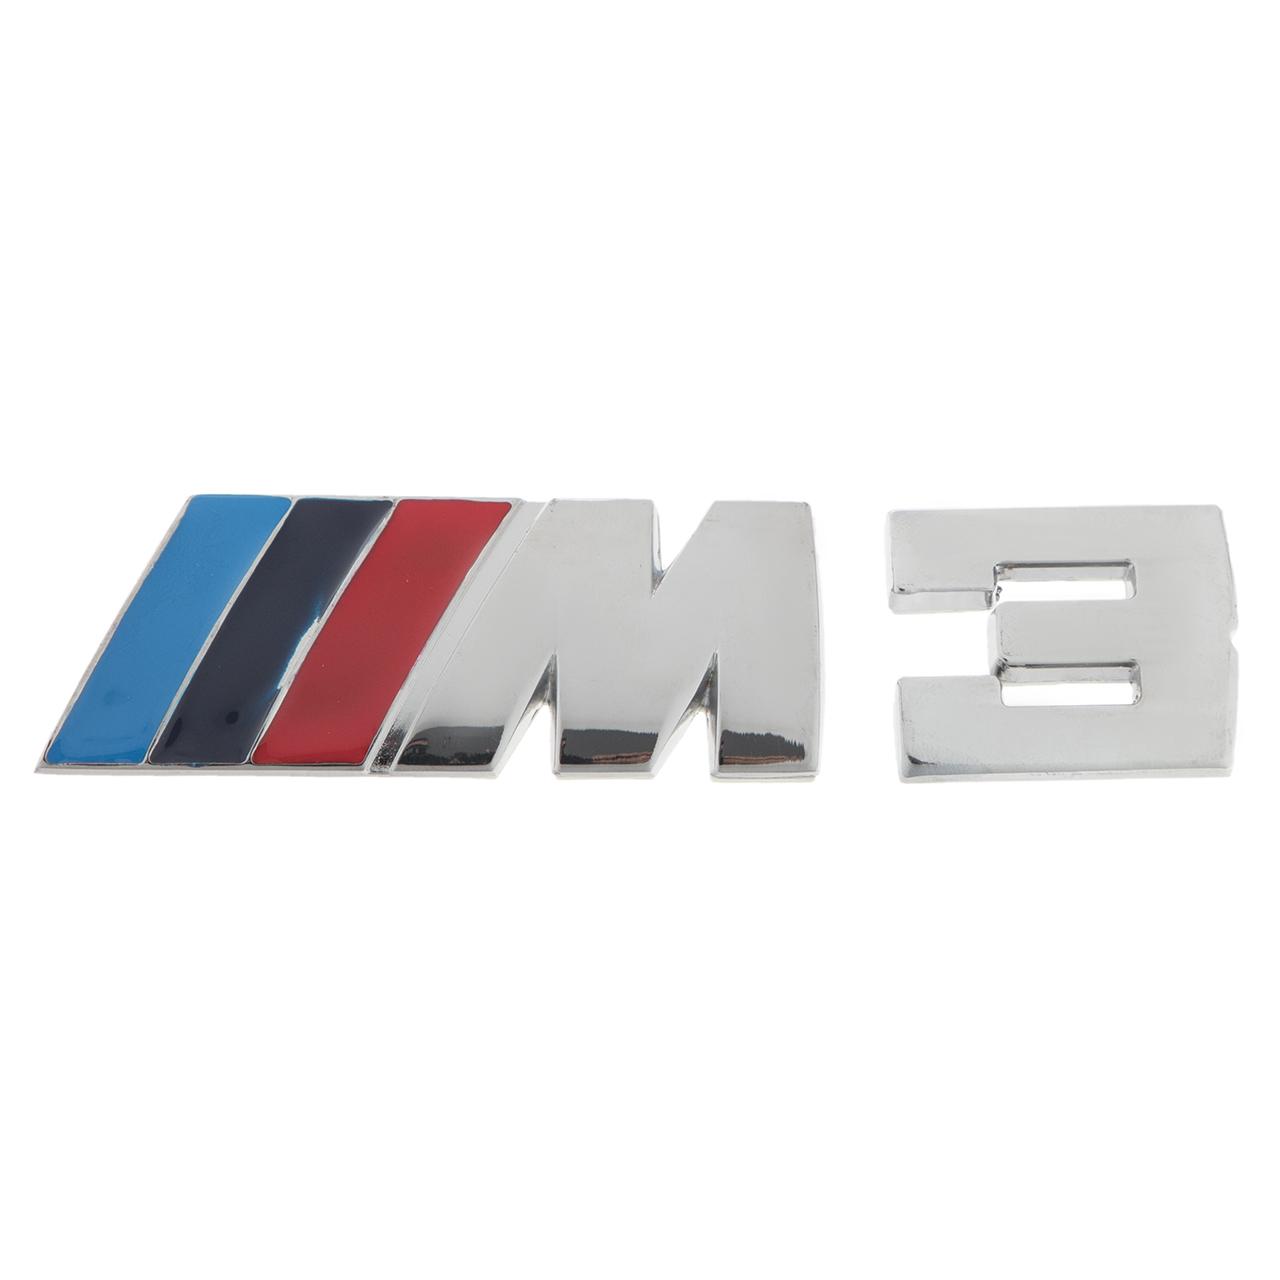 آرم خودرو طرح M3 کد 161